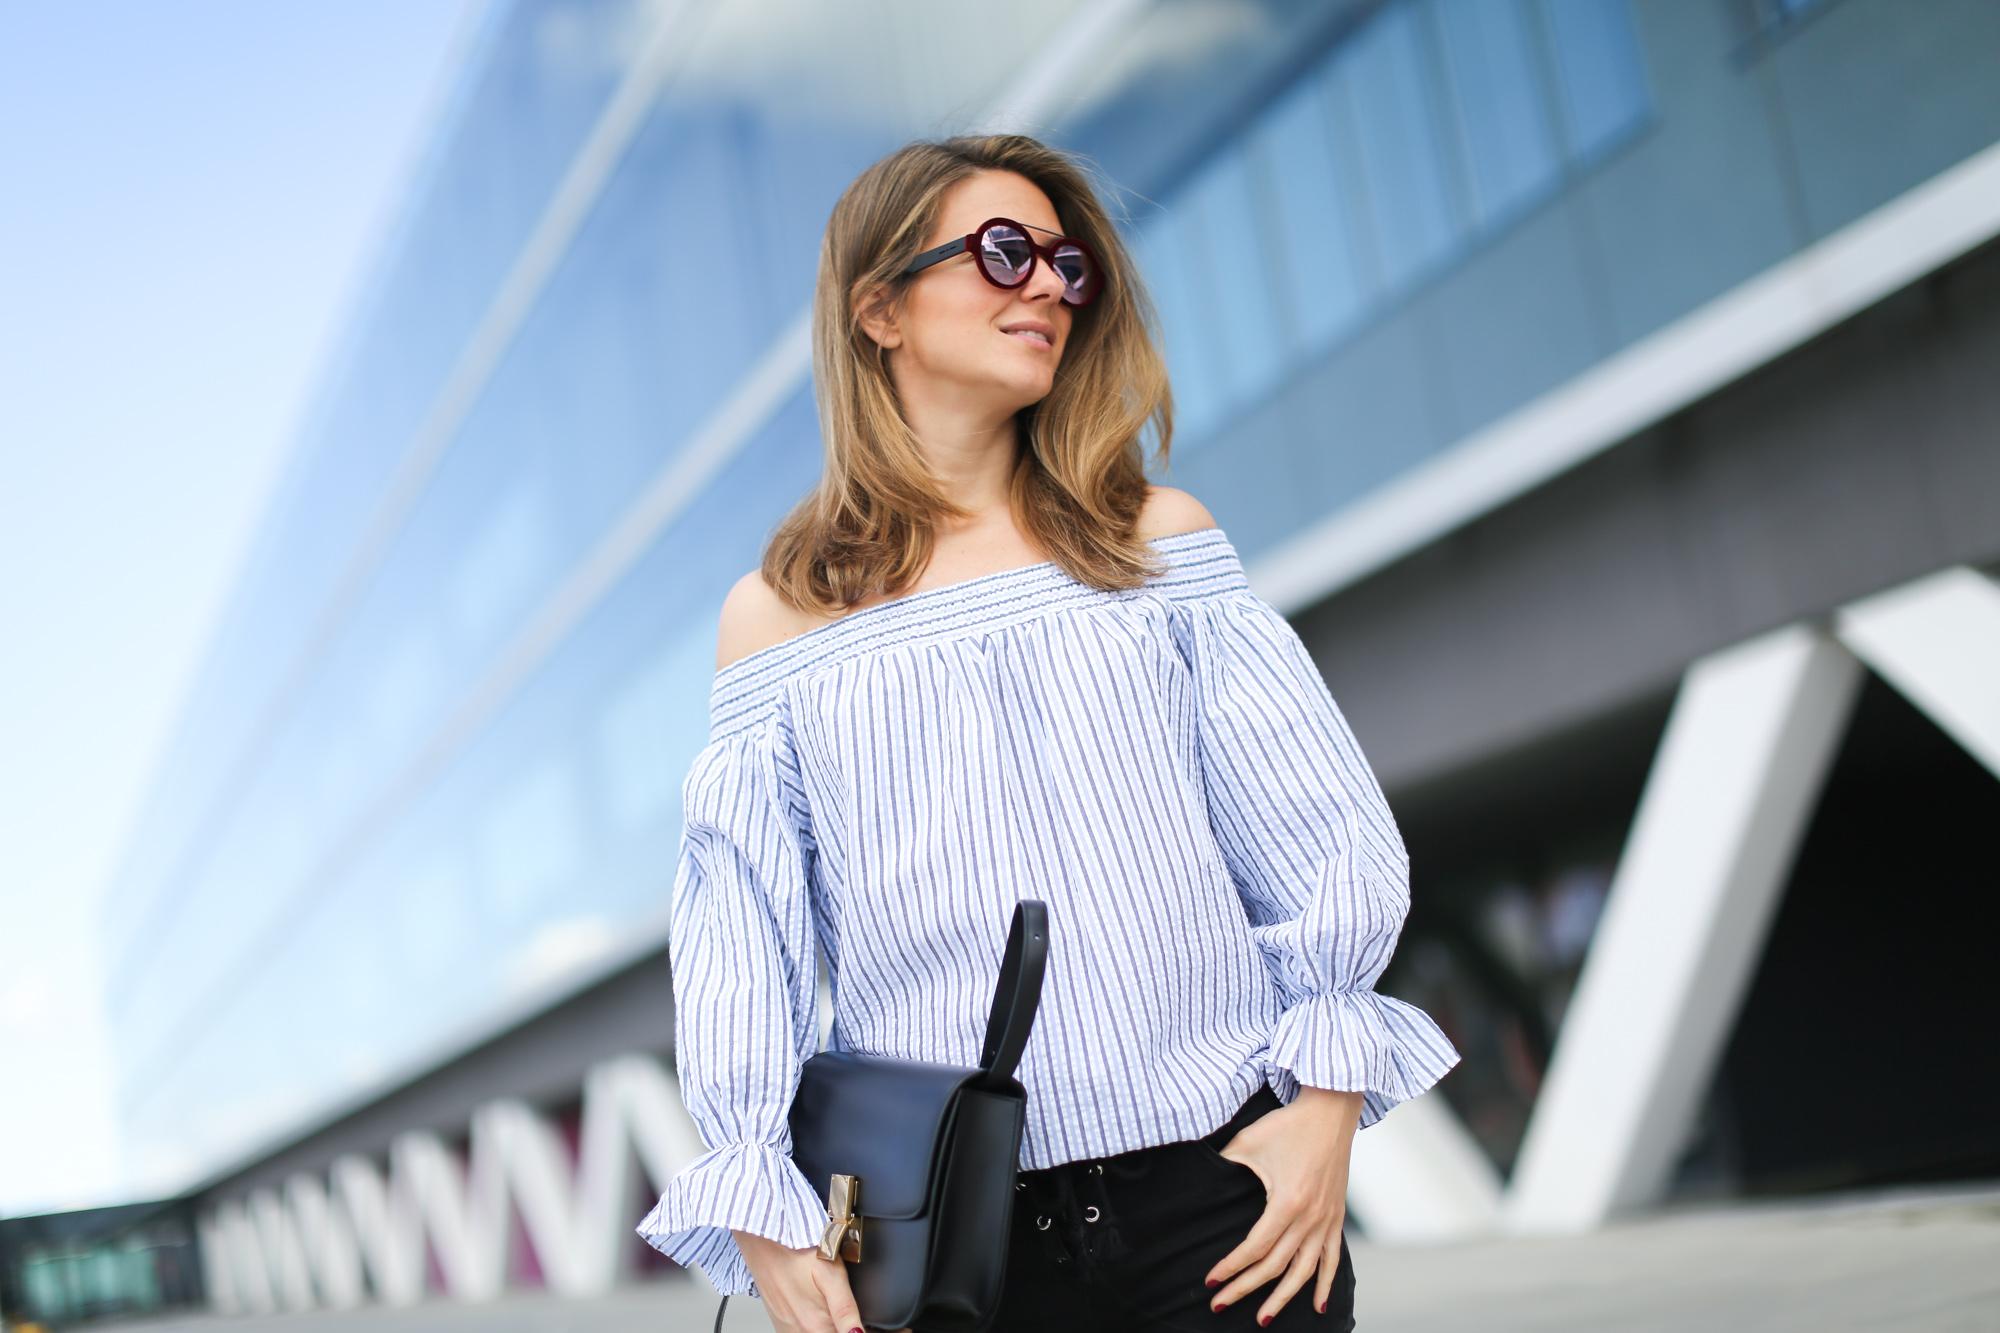 clochet_streetstyle_chicwish_blouse_mango_boho_jeans-5